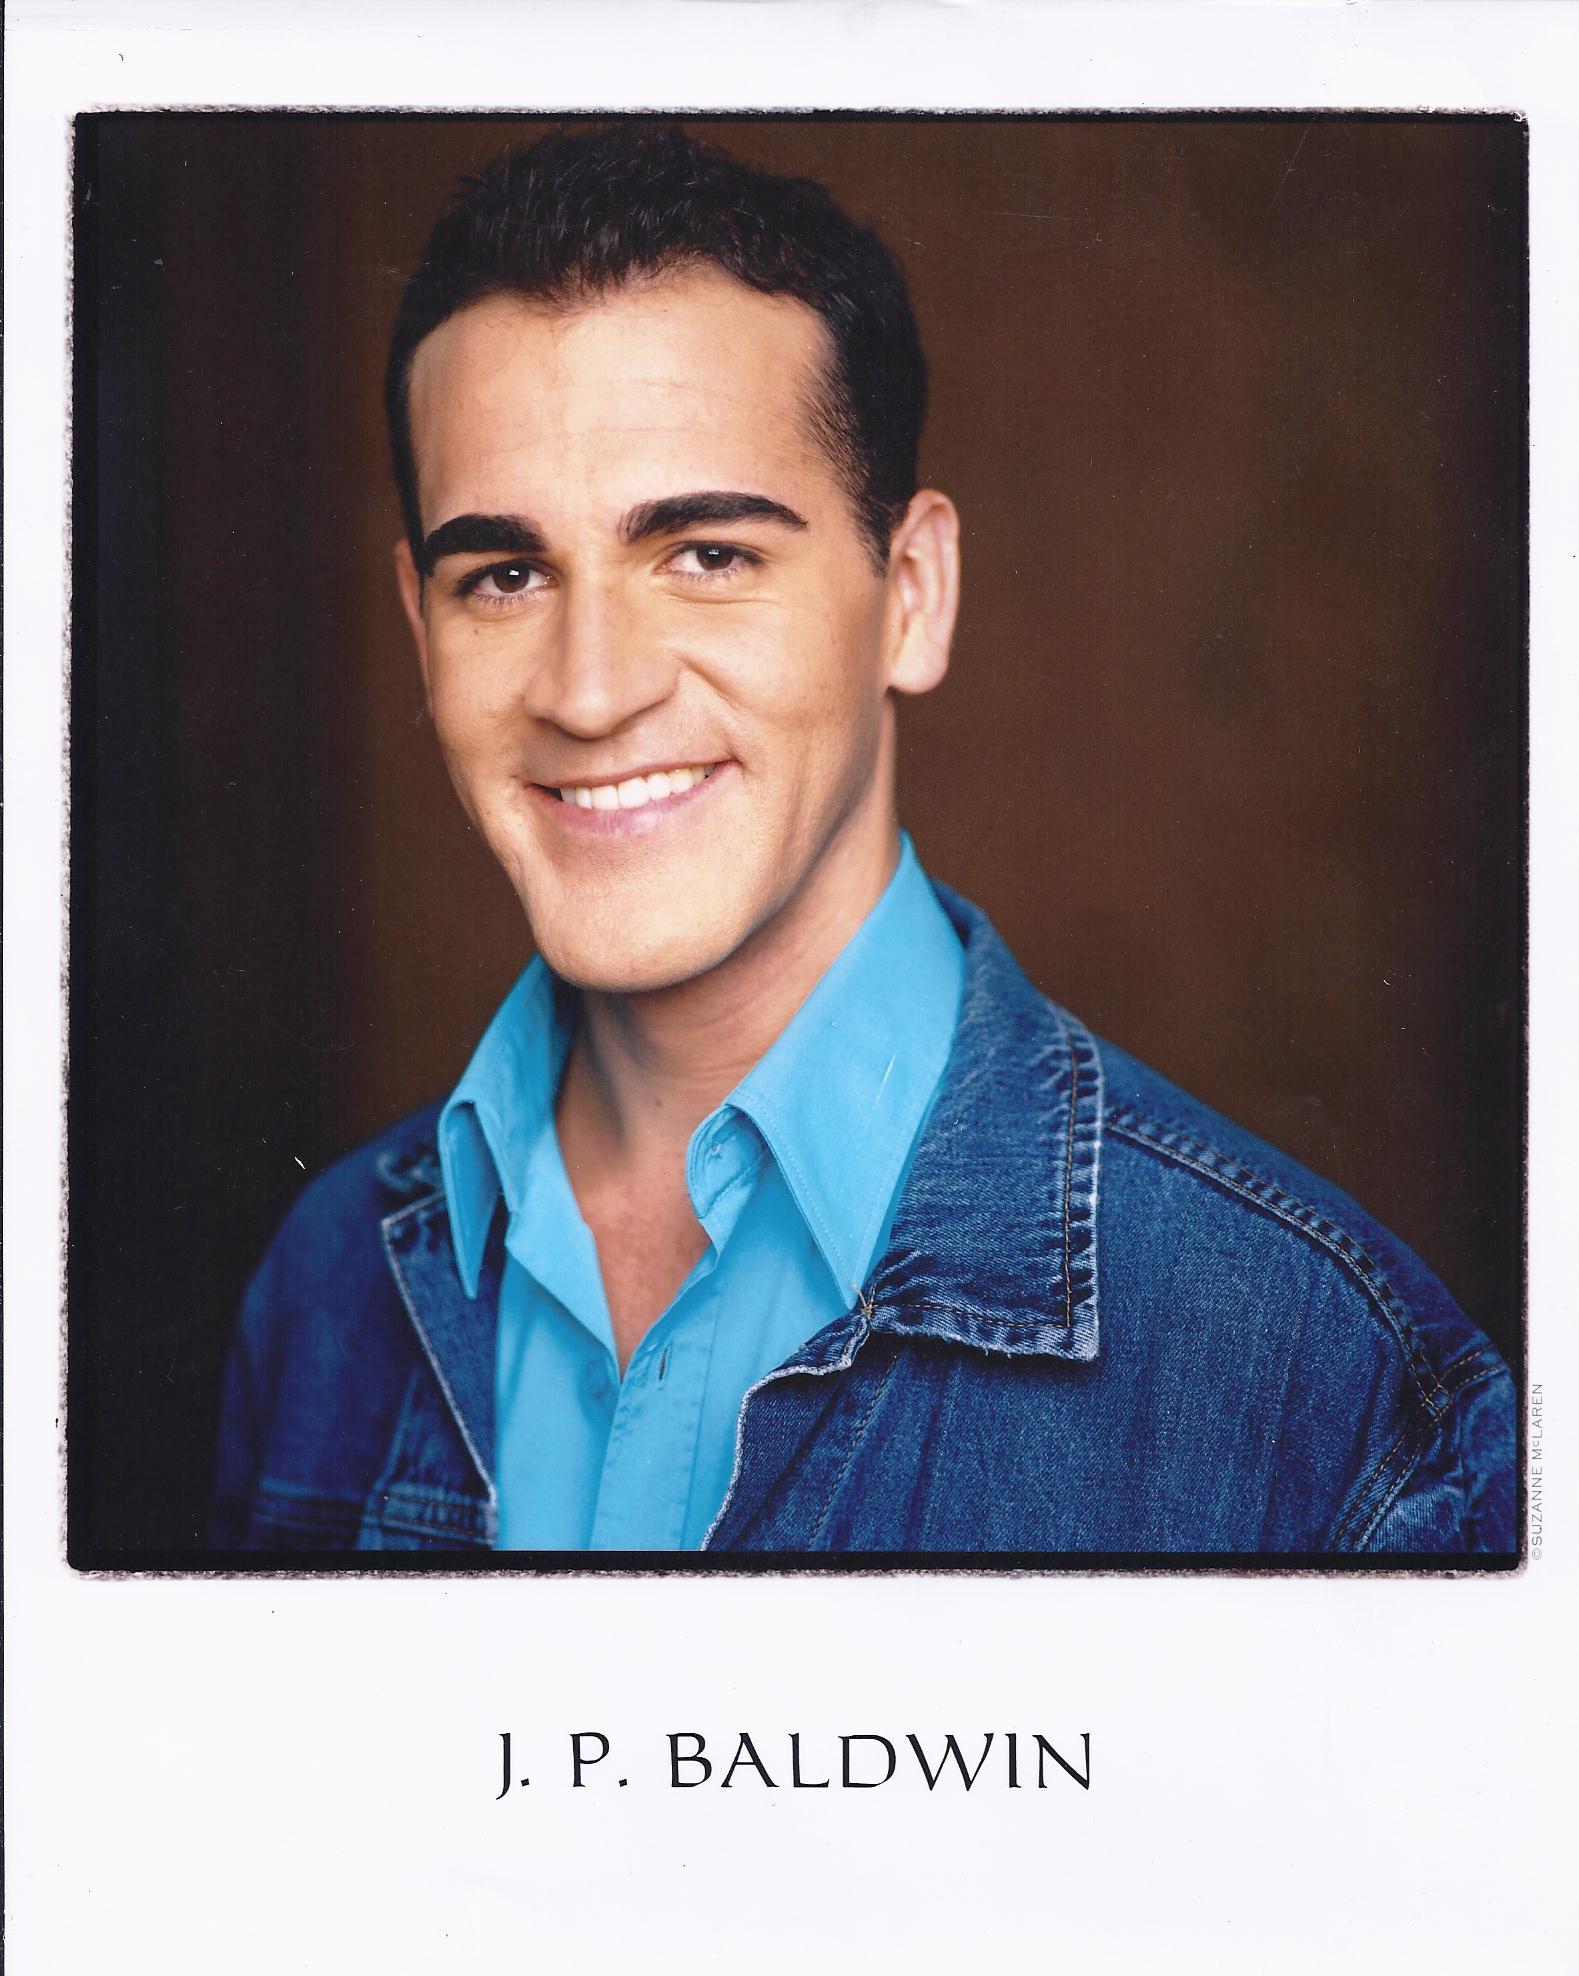 J.P. Baldwin